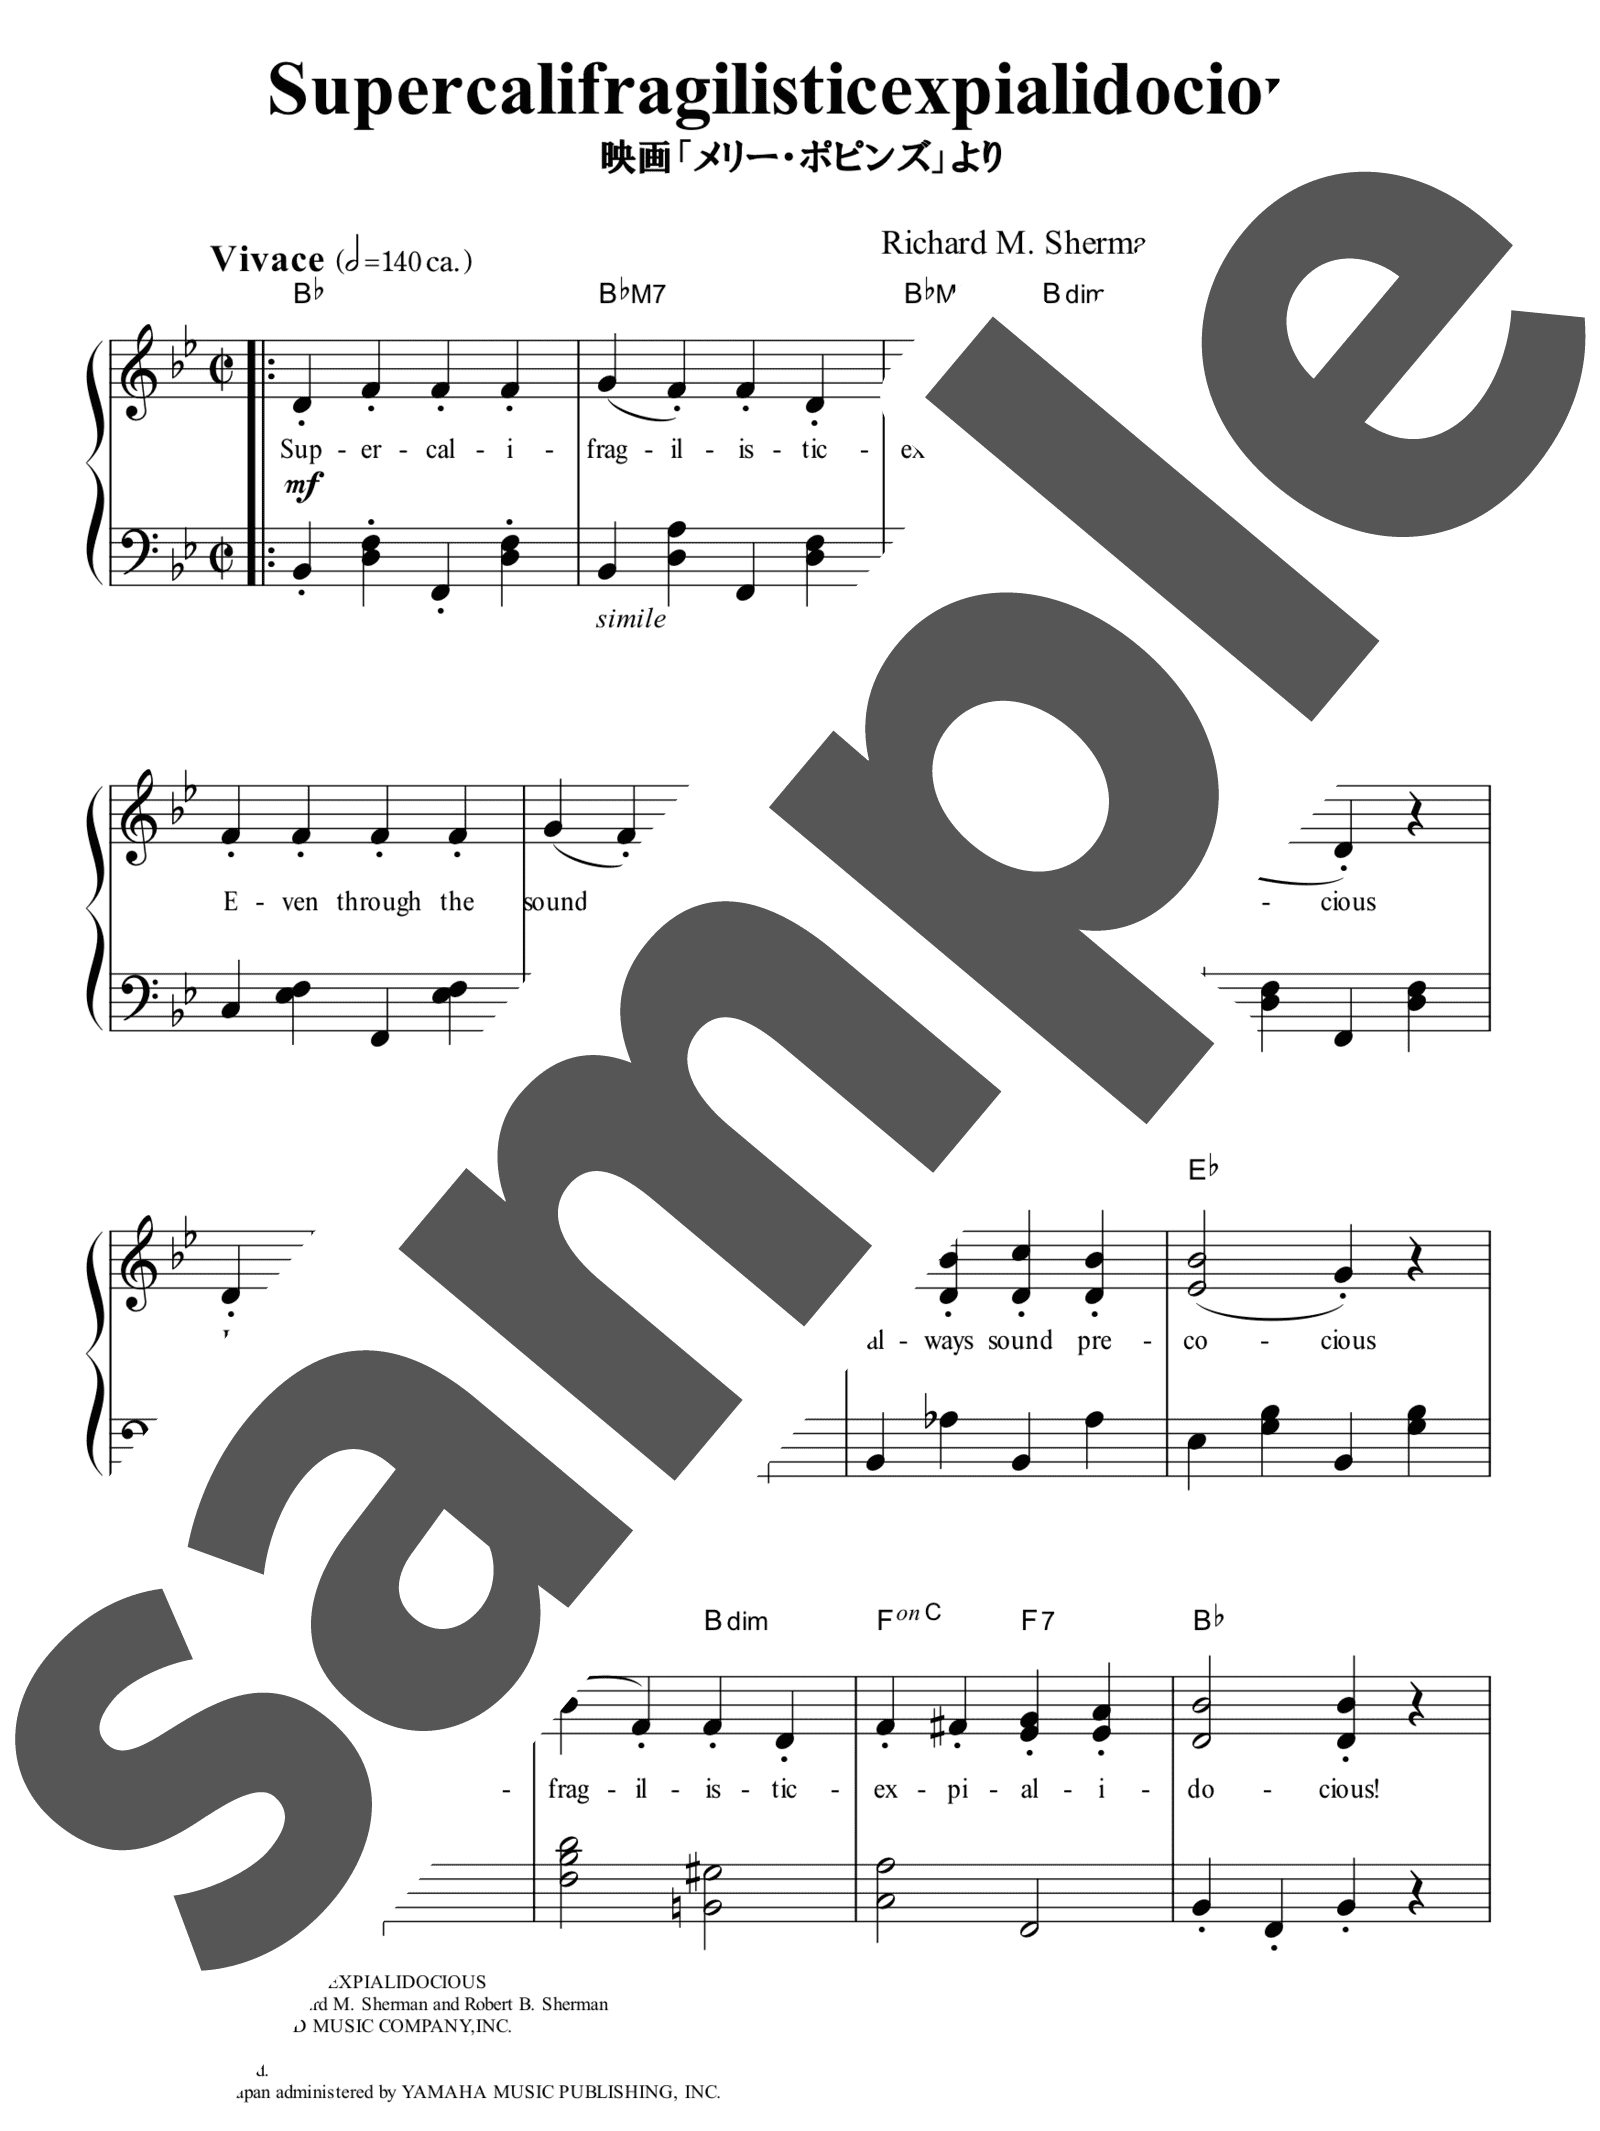 「Supercalifragilisticexpialidocious」のサンプル楽譜